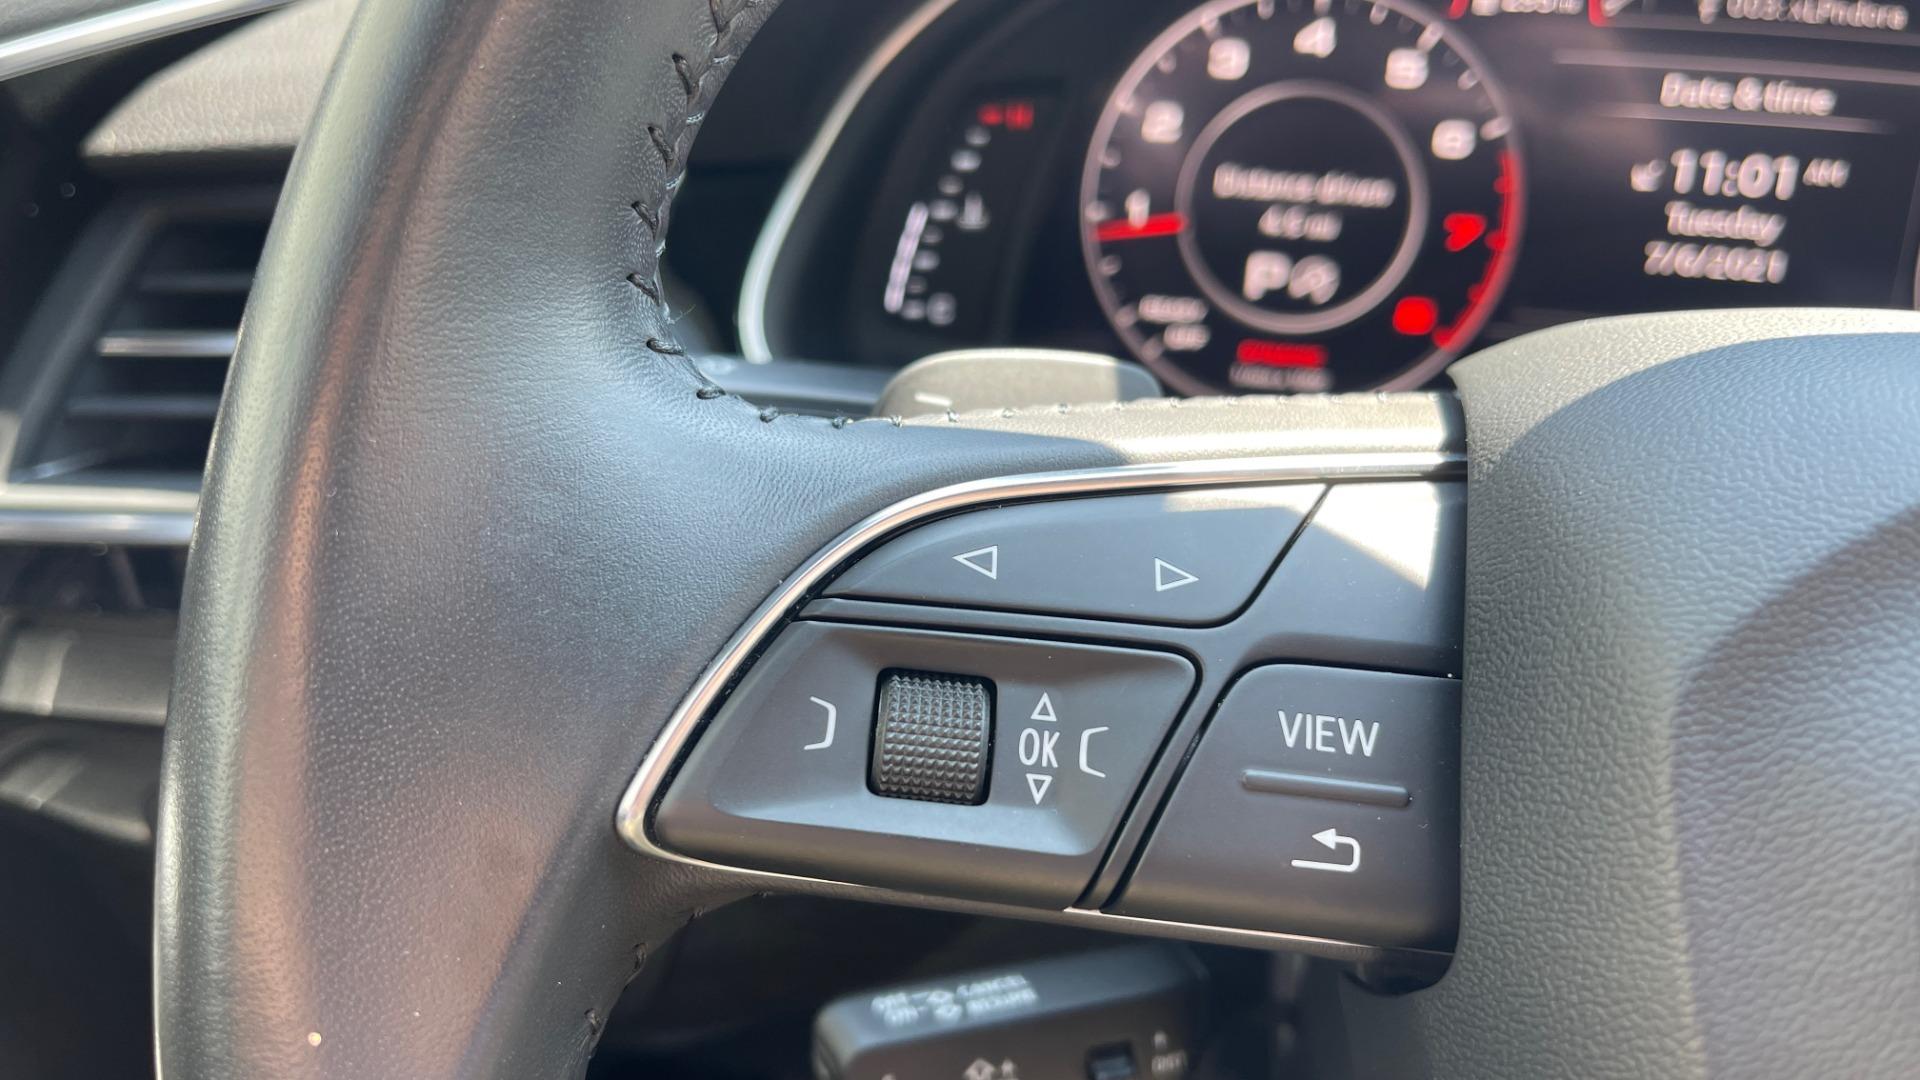 Used 2018 Audi Q7 PRESTIGE TIPTRONIC / NAV / SUNROOF / ADAPTIVE PKG / DRVR ASST / CLD WTHR /  for sale $49,995 at Formula Imports in Charlotte NC 28227 39